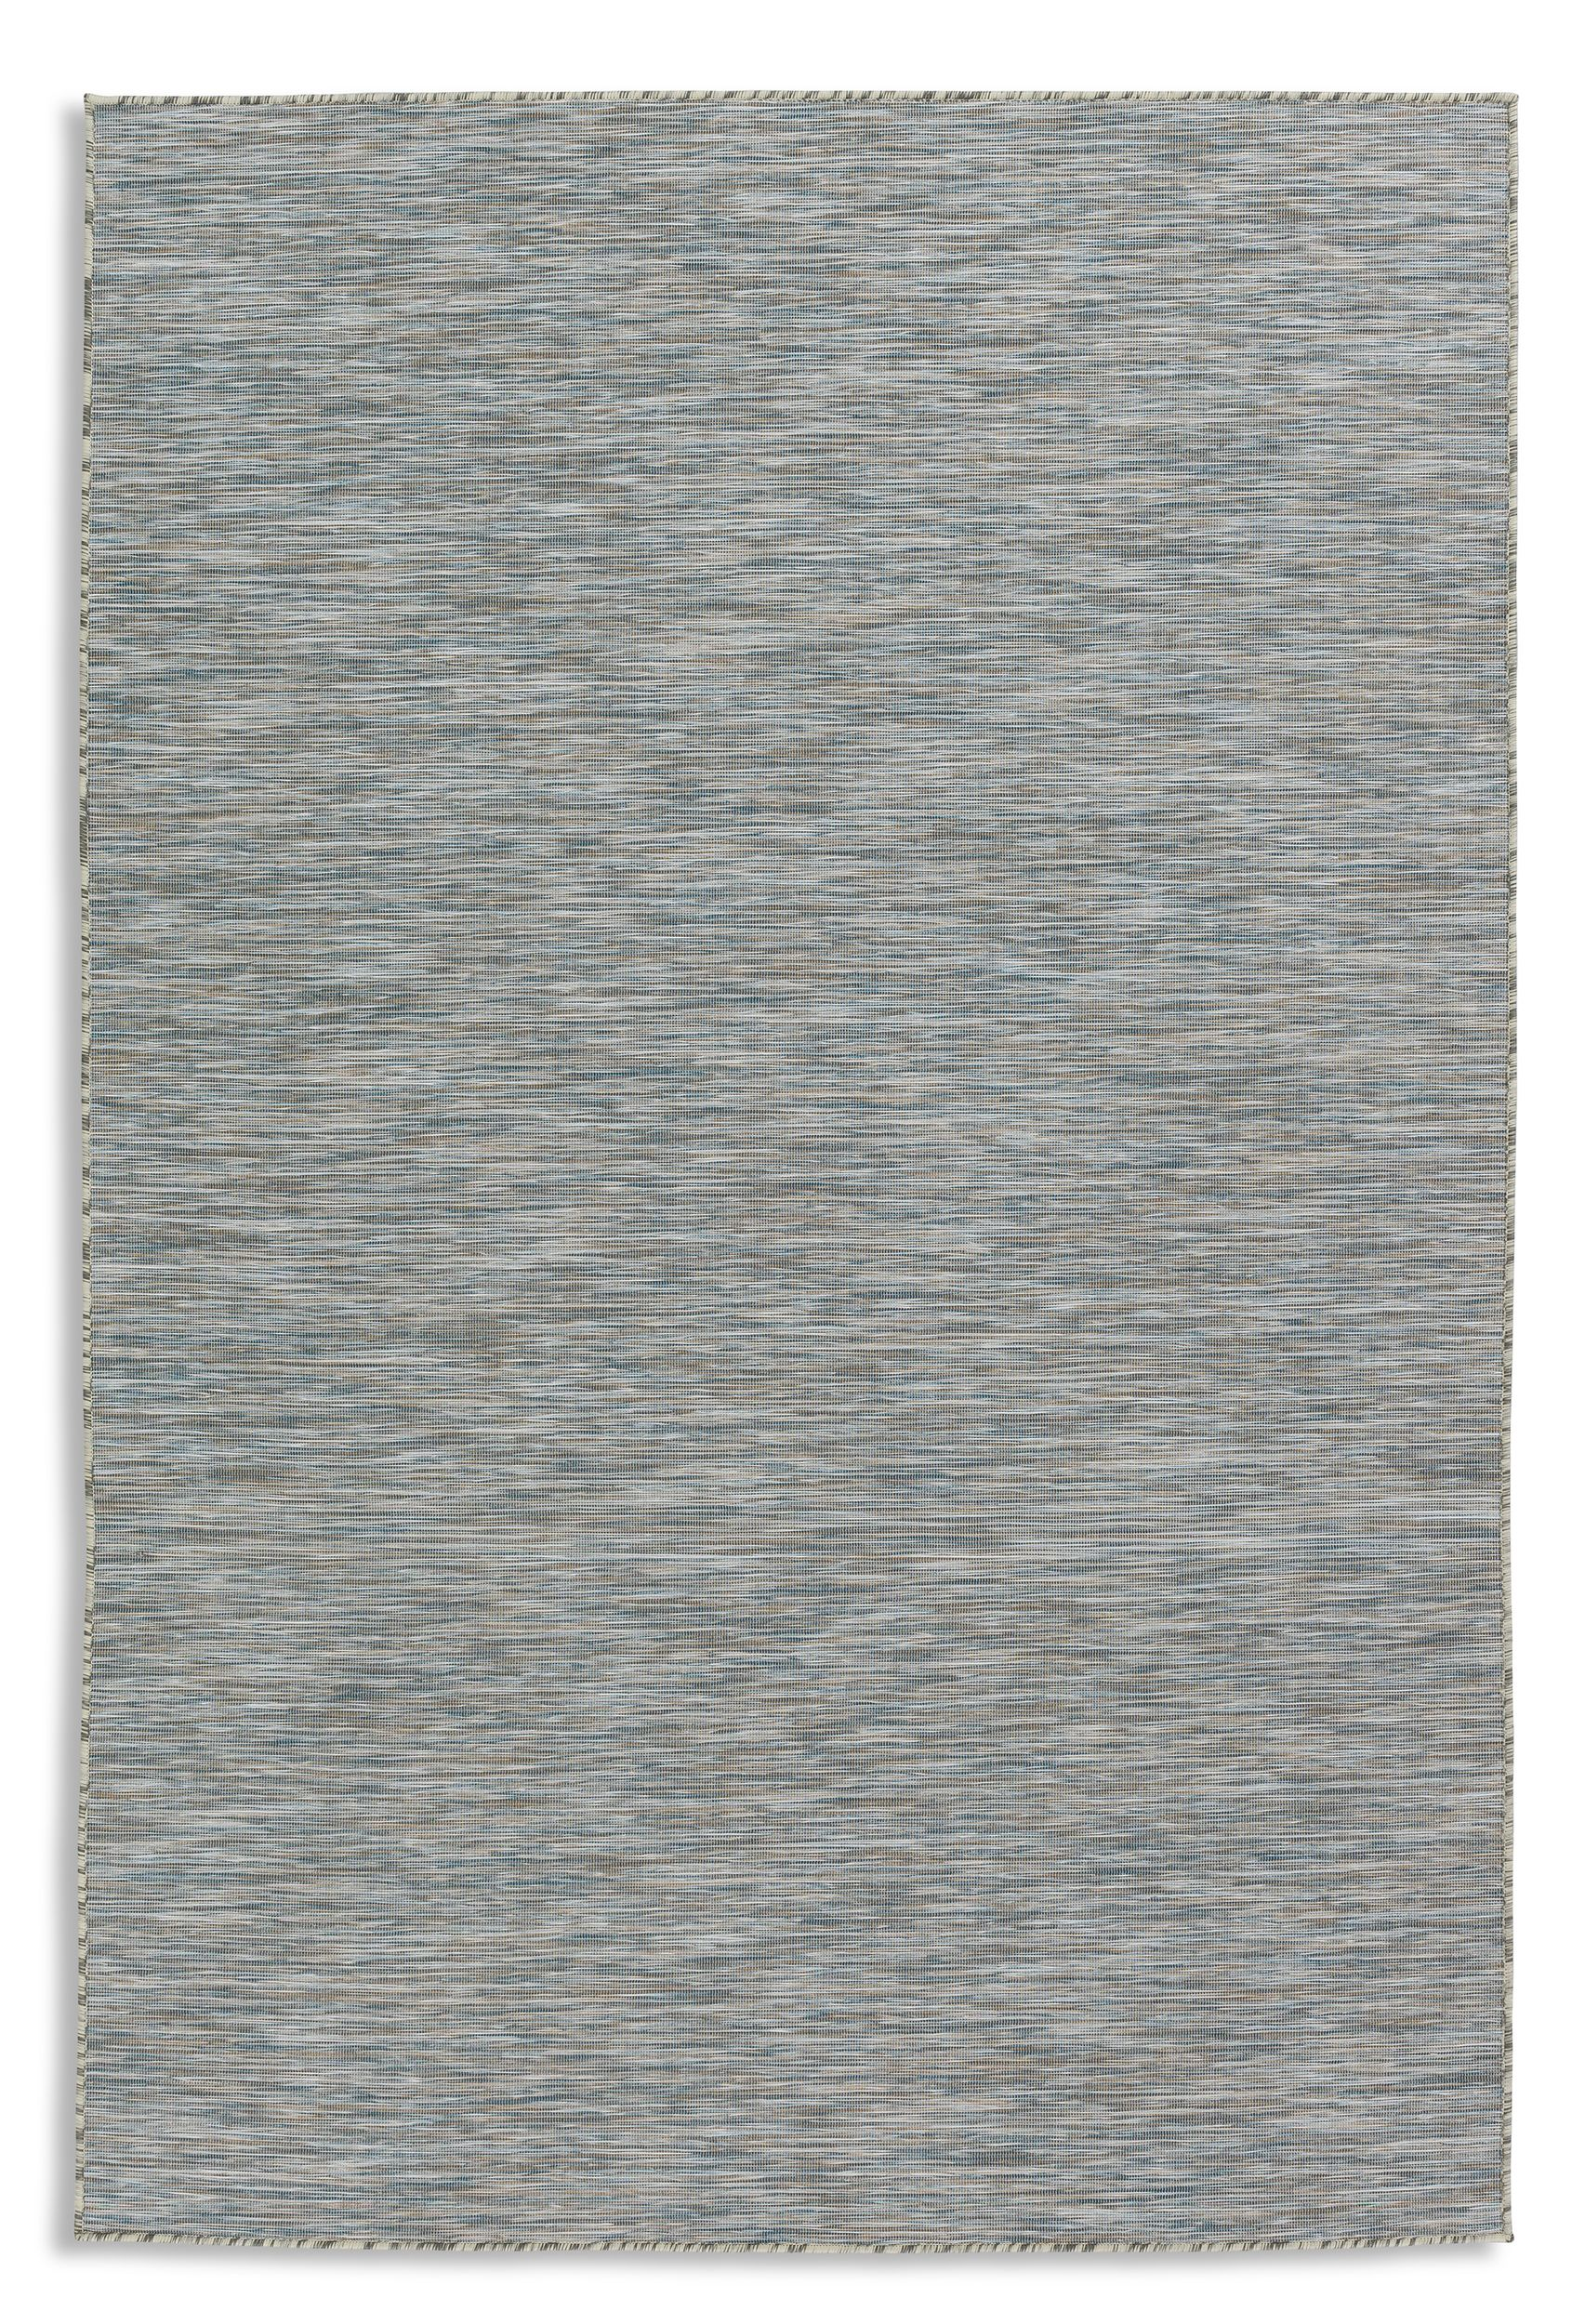 Teppich 80x150cm AMALFI